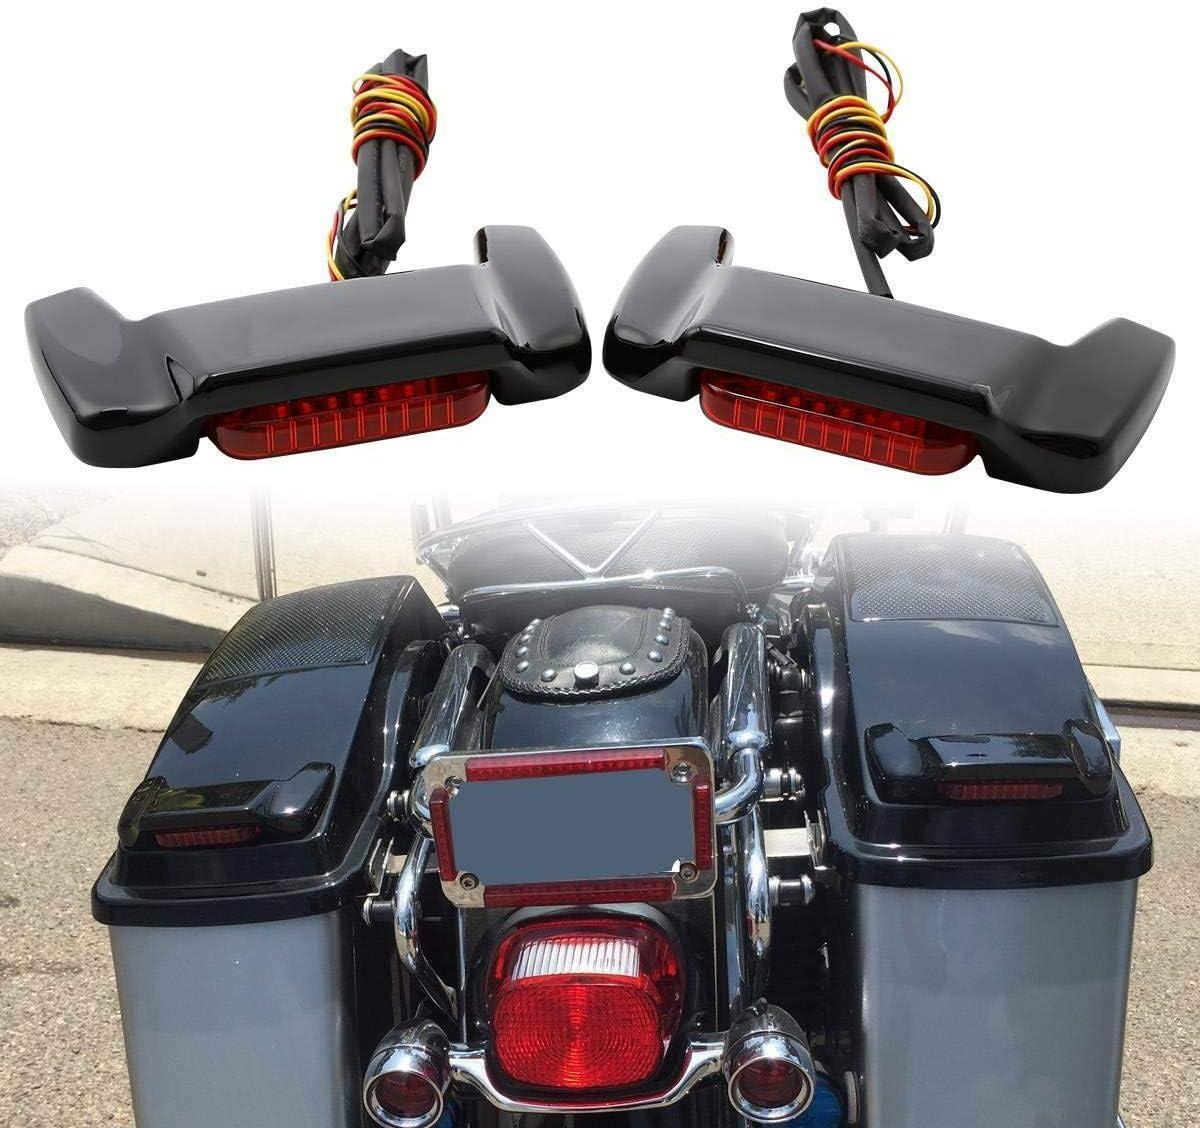 TCT-MT Hard Saddlebag Lid LED Spoiler Saddle Bag Fit For Harley Touring Electra Road King Glide 1993-2013 Ultra Classic FLHTCU CVO Ultra FLHTC FLHTK Anniversary FLHTCUSE8